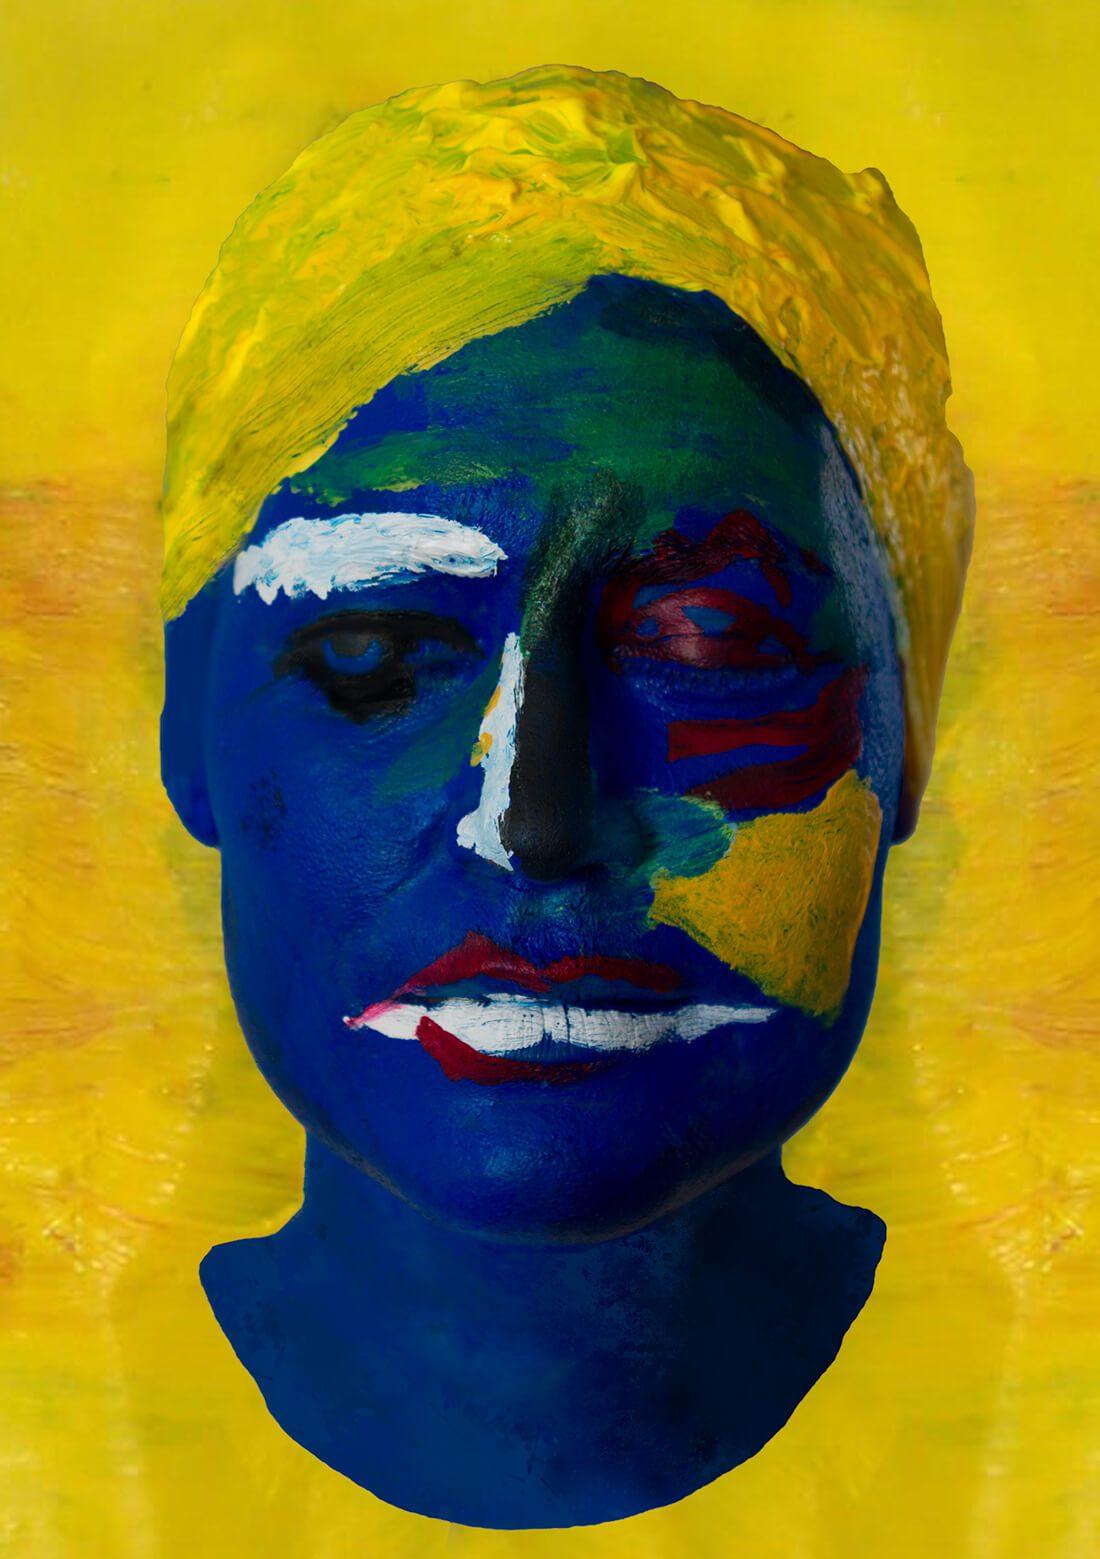 Faces - feeling blue living art